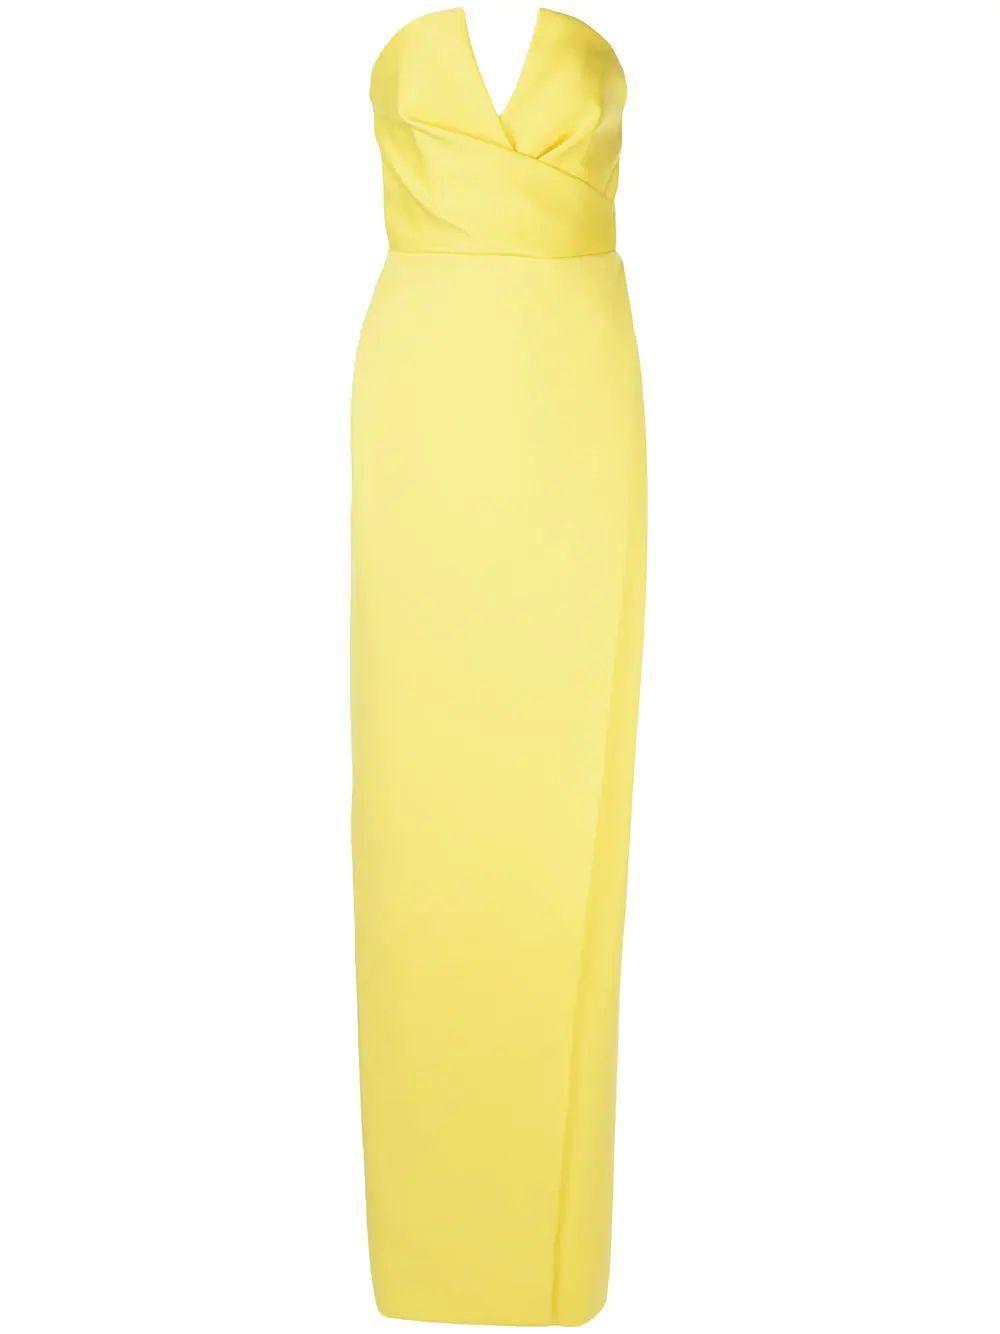 Darcy Satin Strapless Gown